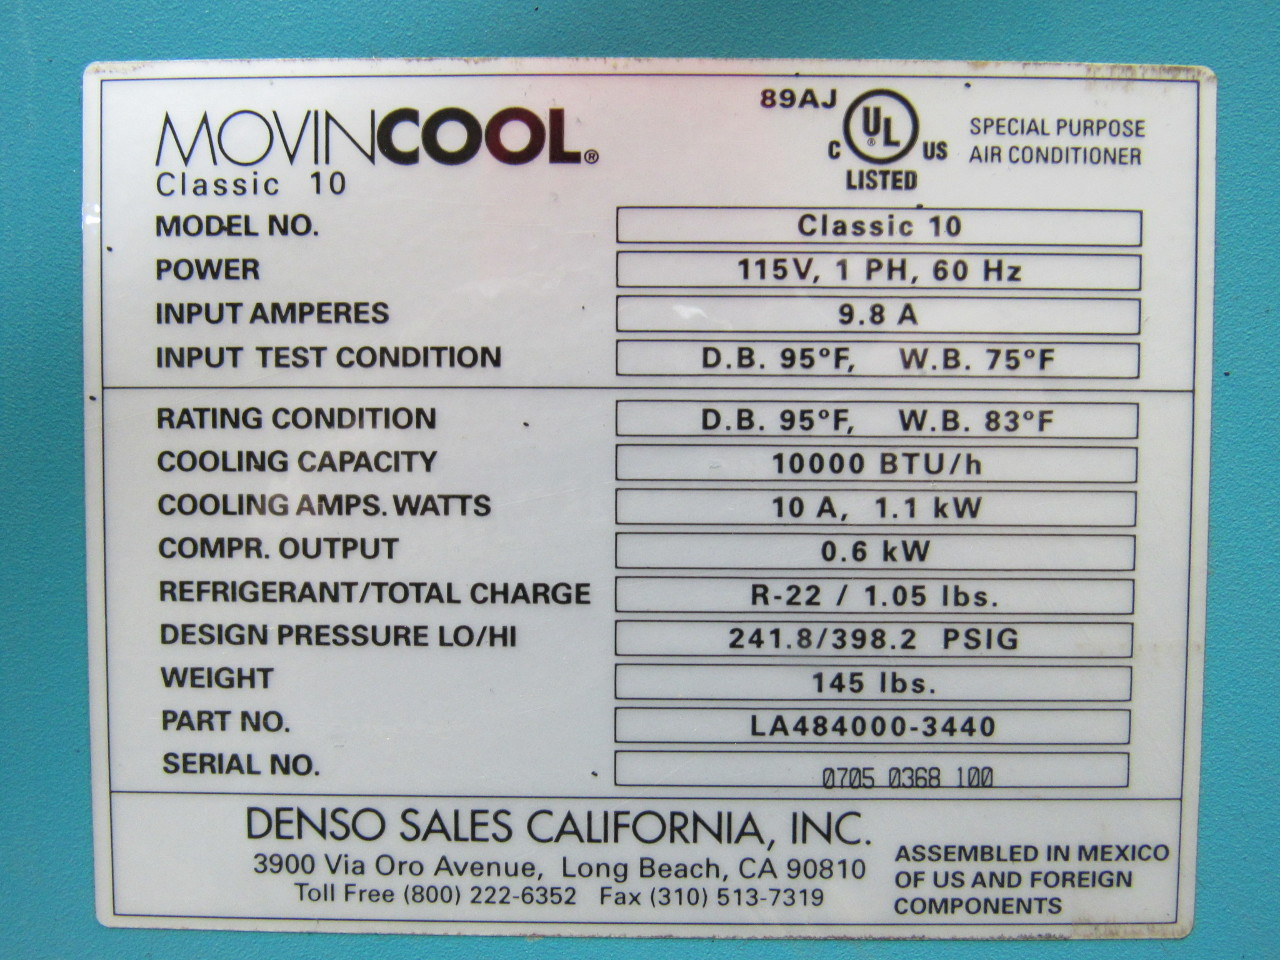 Movincool Classic 10 Portable Air Conditioner 115v 1ph 10 000 Btu/hr  #368495